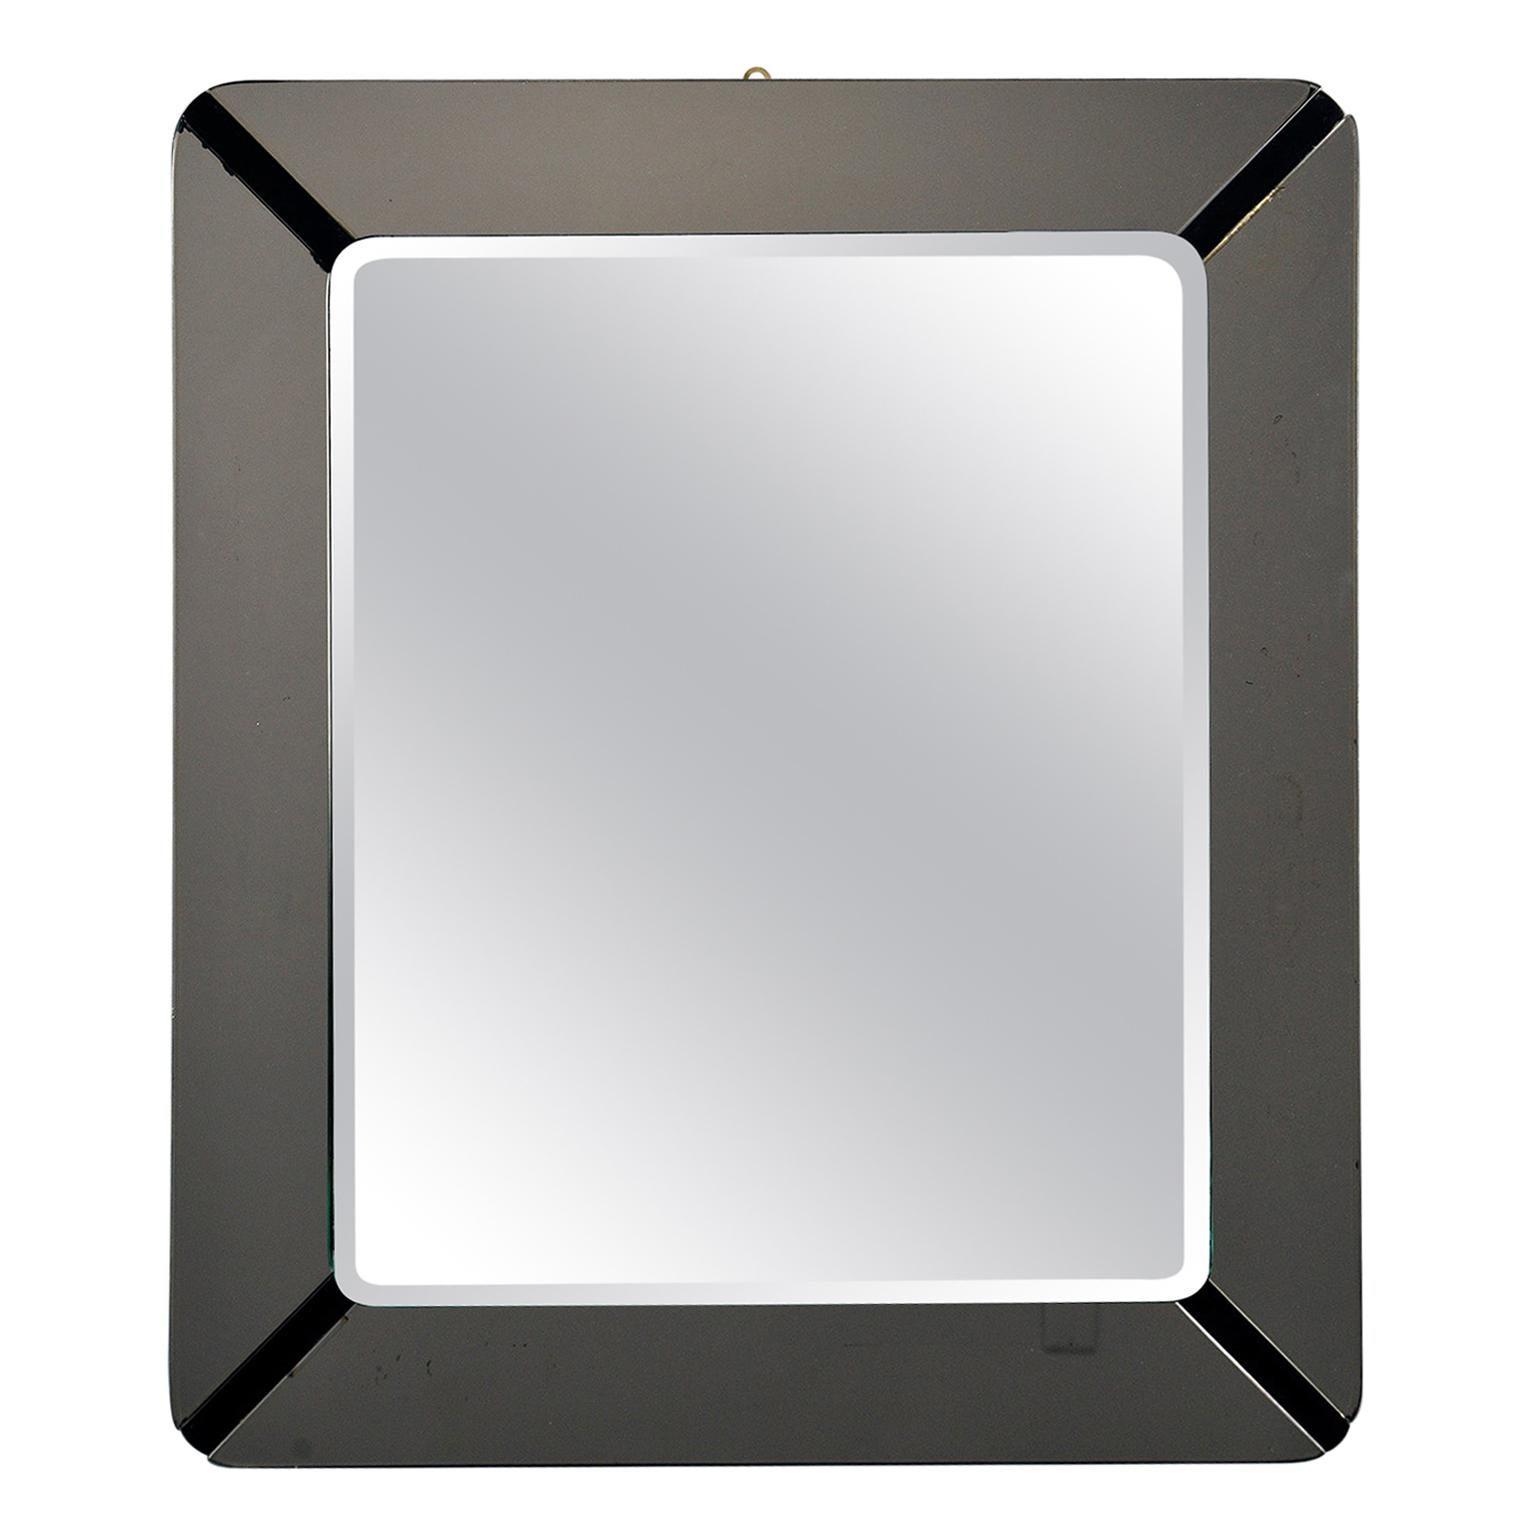 Cristal Arte Wall Mirrors